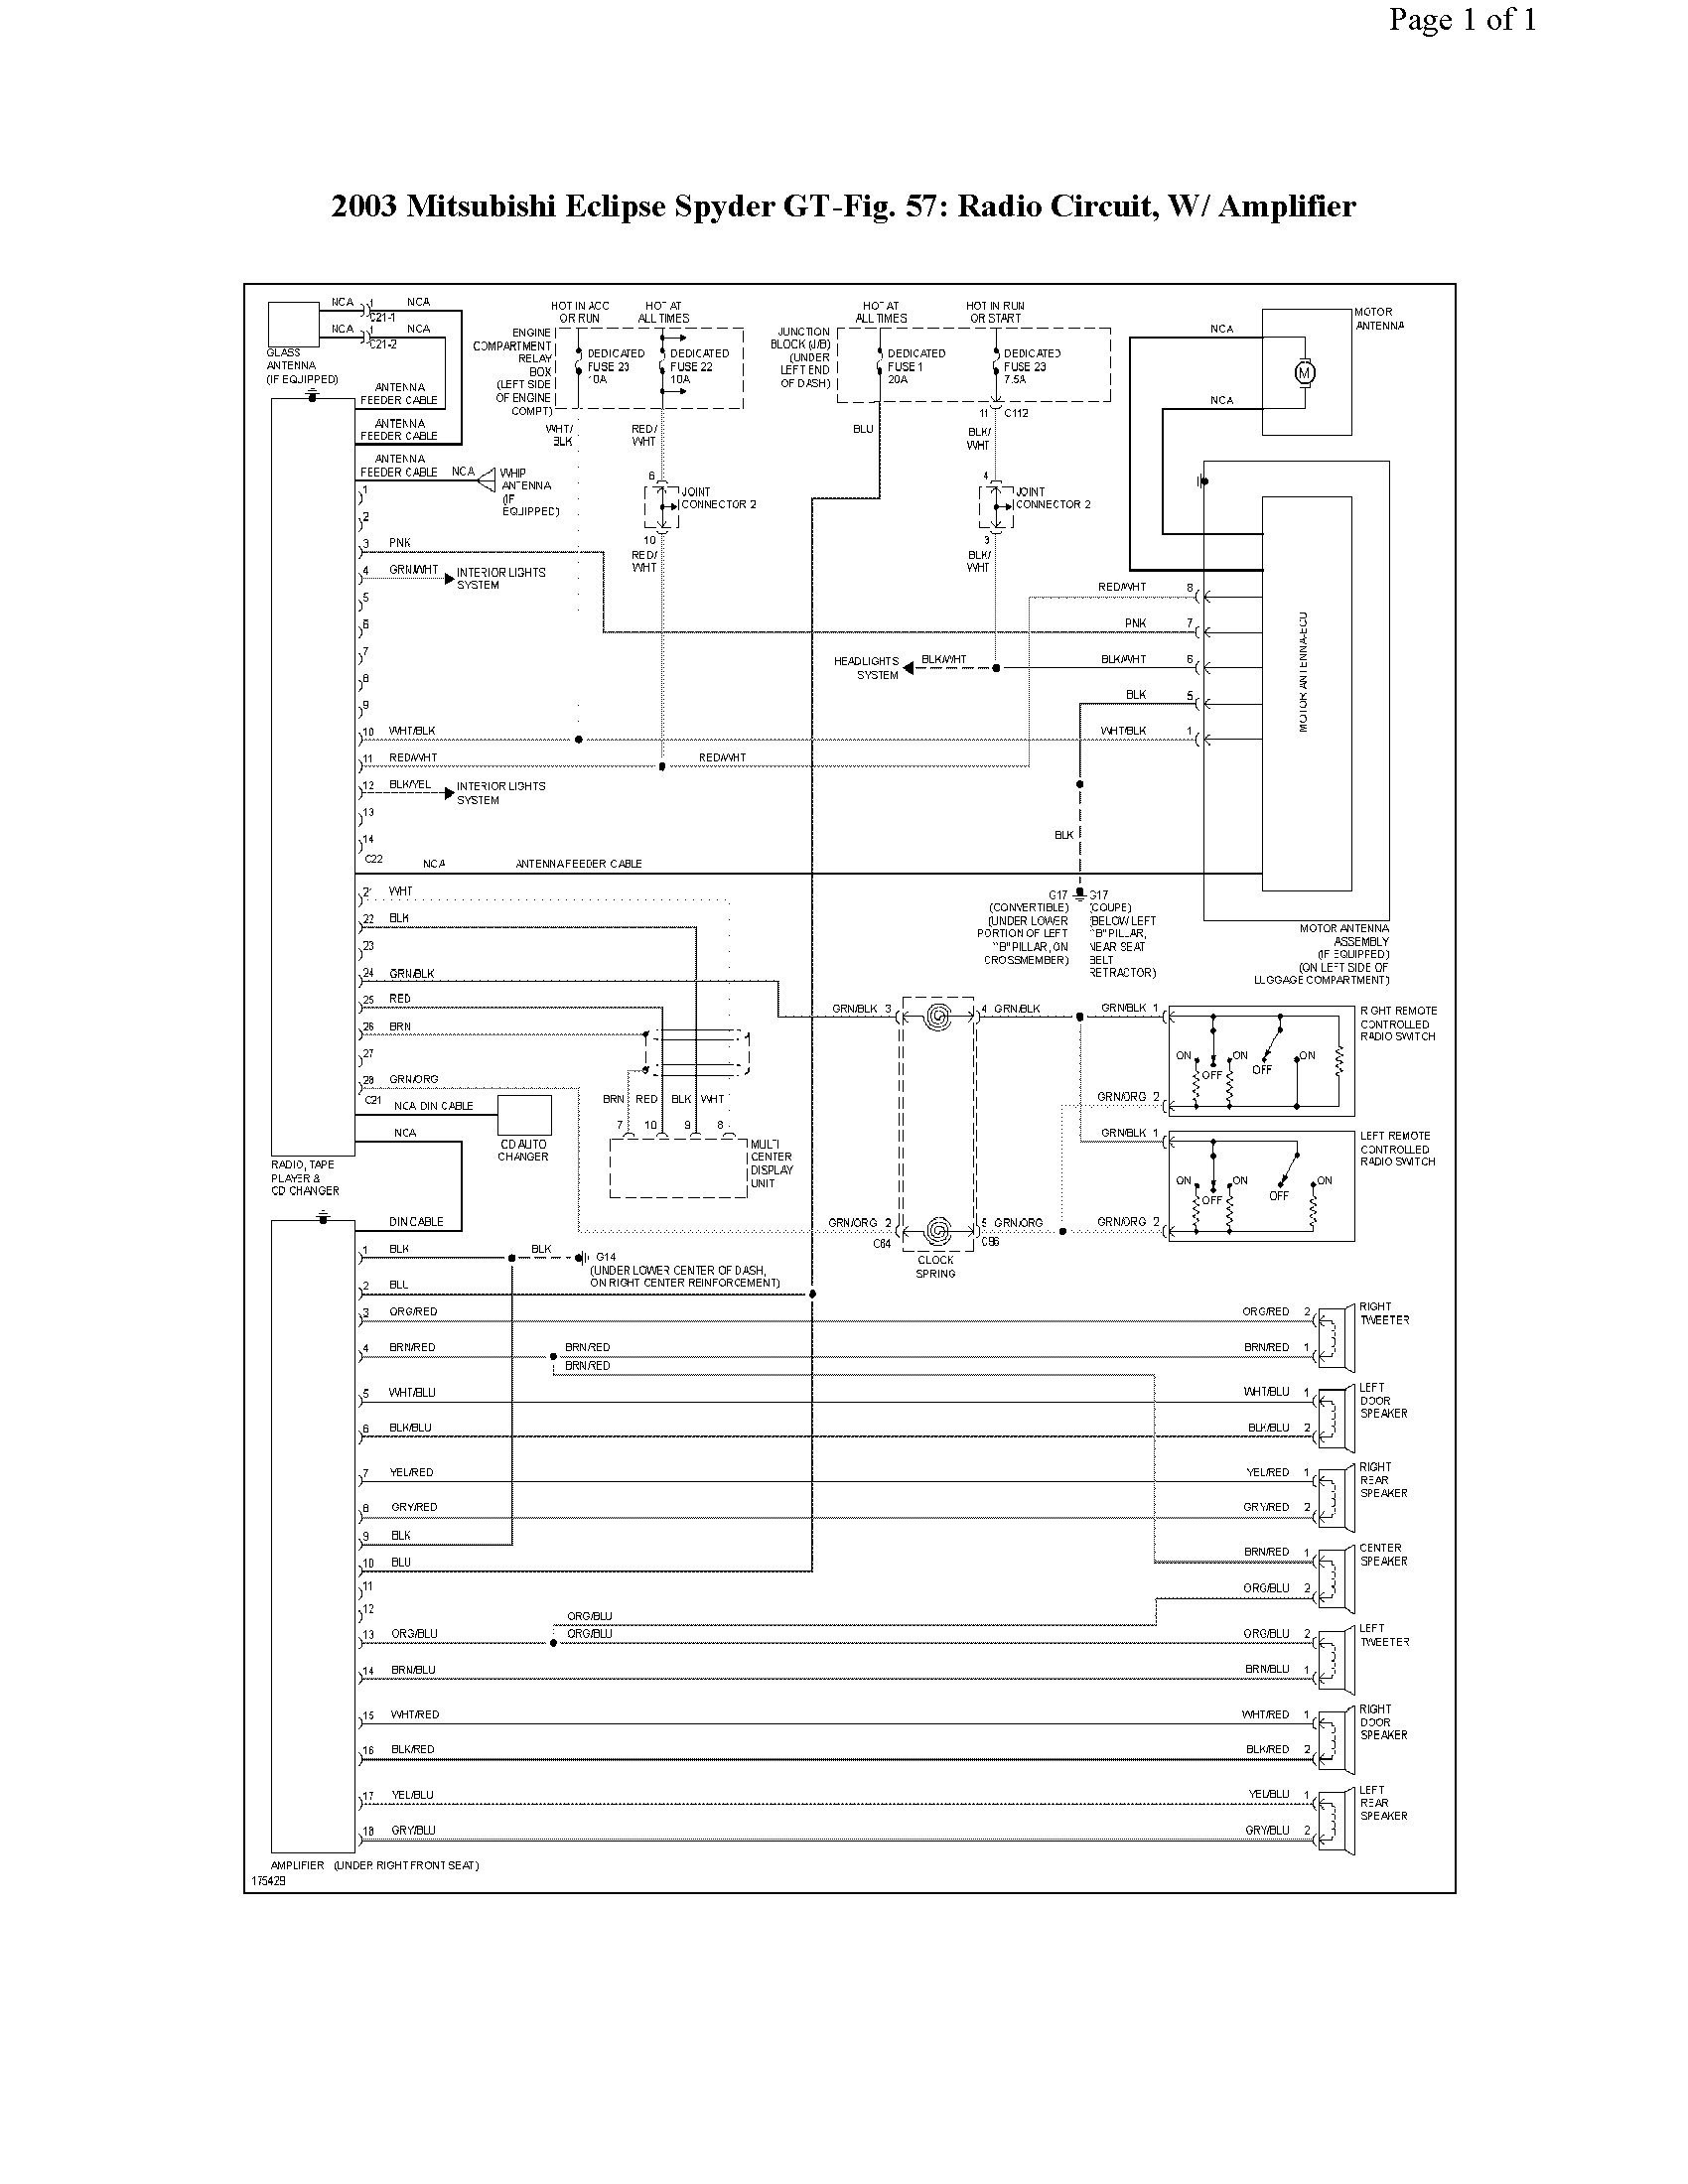 Mitsubishi Eclipse Wiring Diagram Car Stereo Wiring Diagram Mitsubishi Wiring solutions Of Mitsubishi Eclipse Wiring Diagram